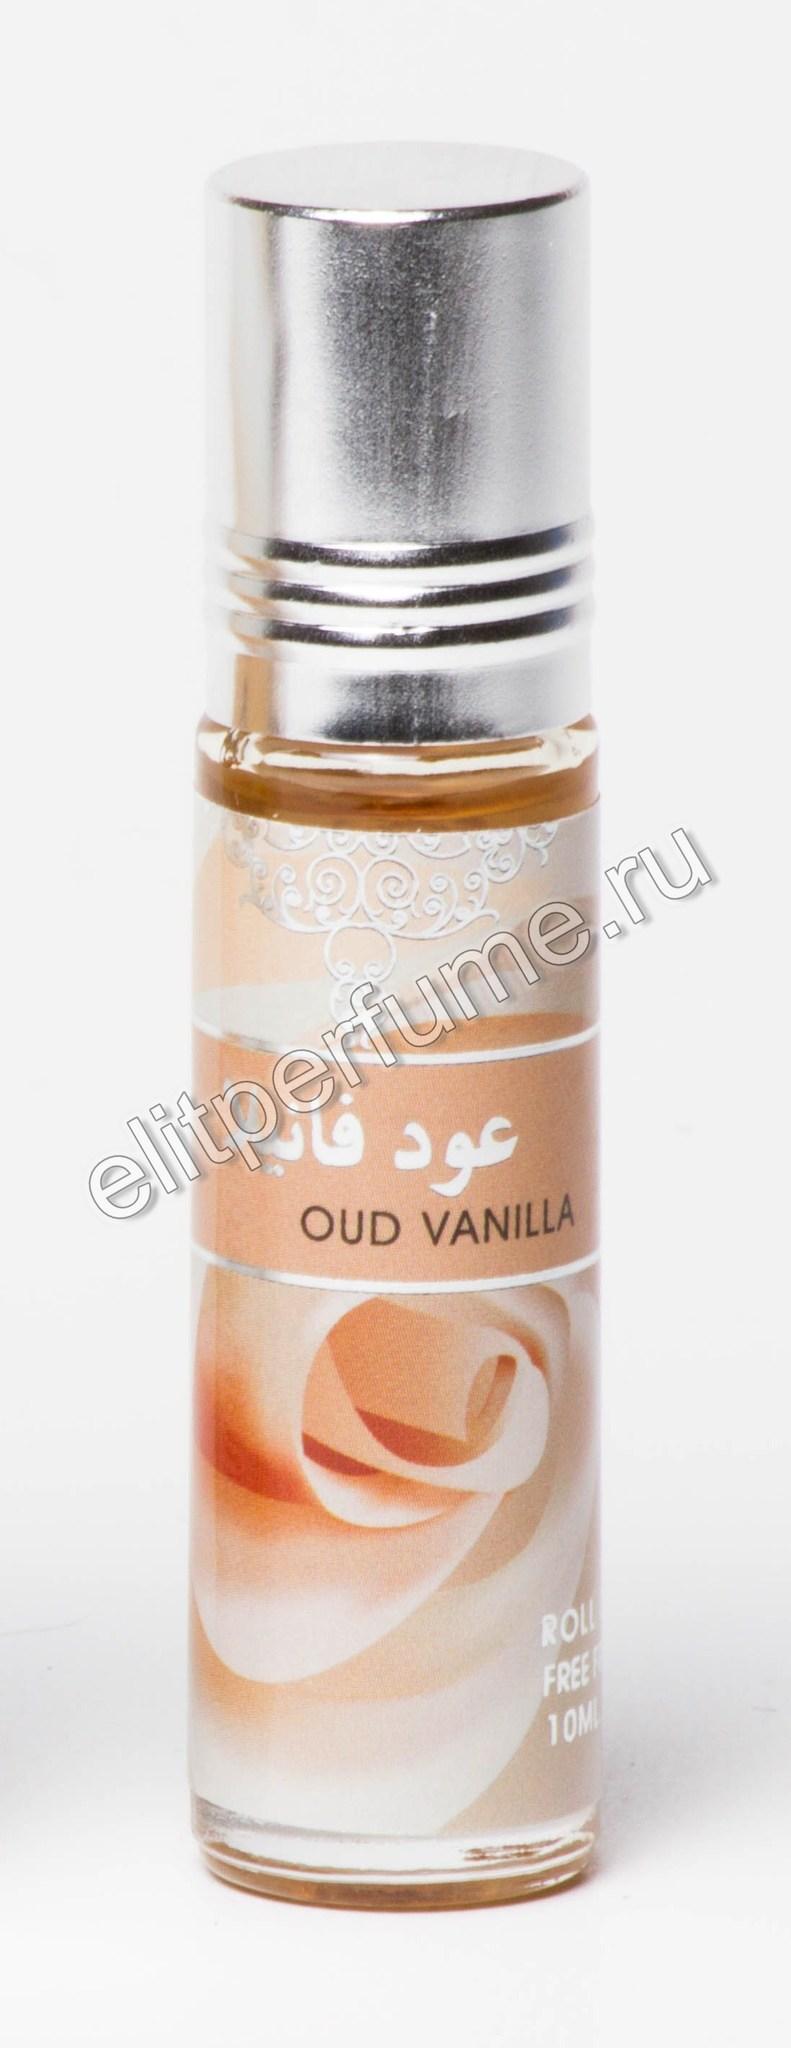 Oud Vanila Уд Ванила 10 мл арабские масляные духи от Ард Аль Заафаран Ard Al Zaafaran